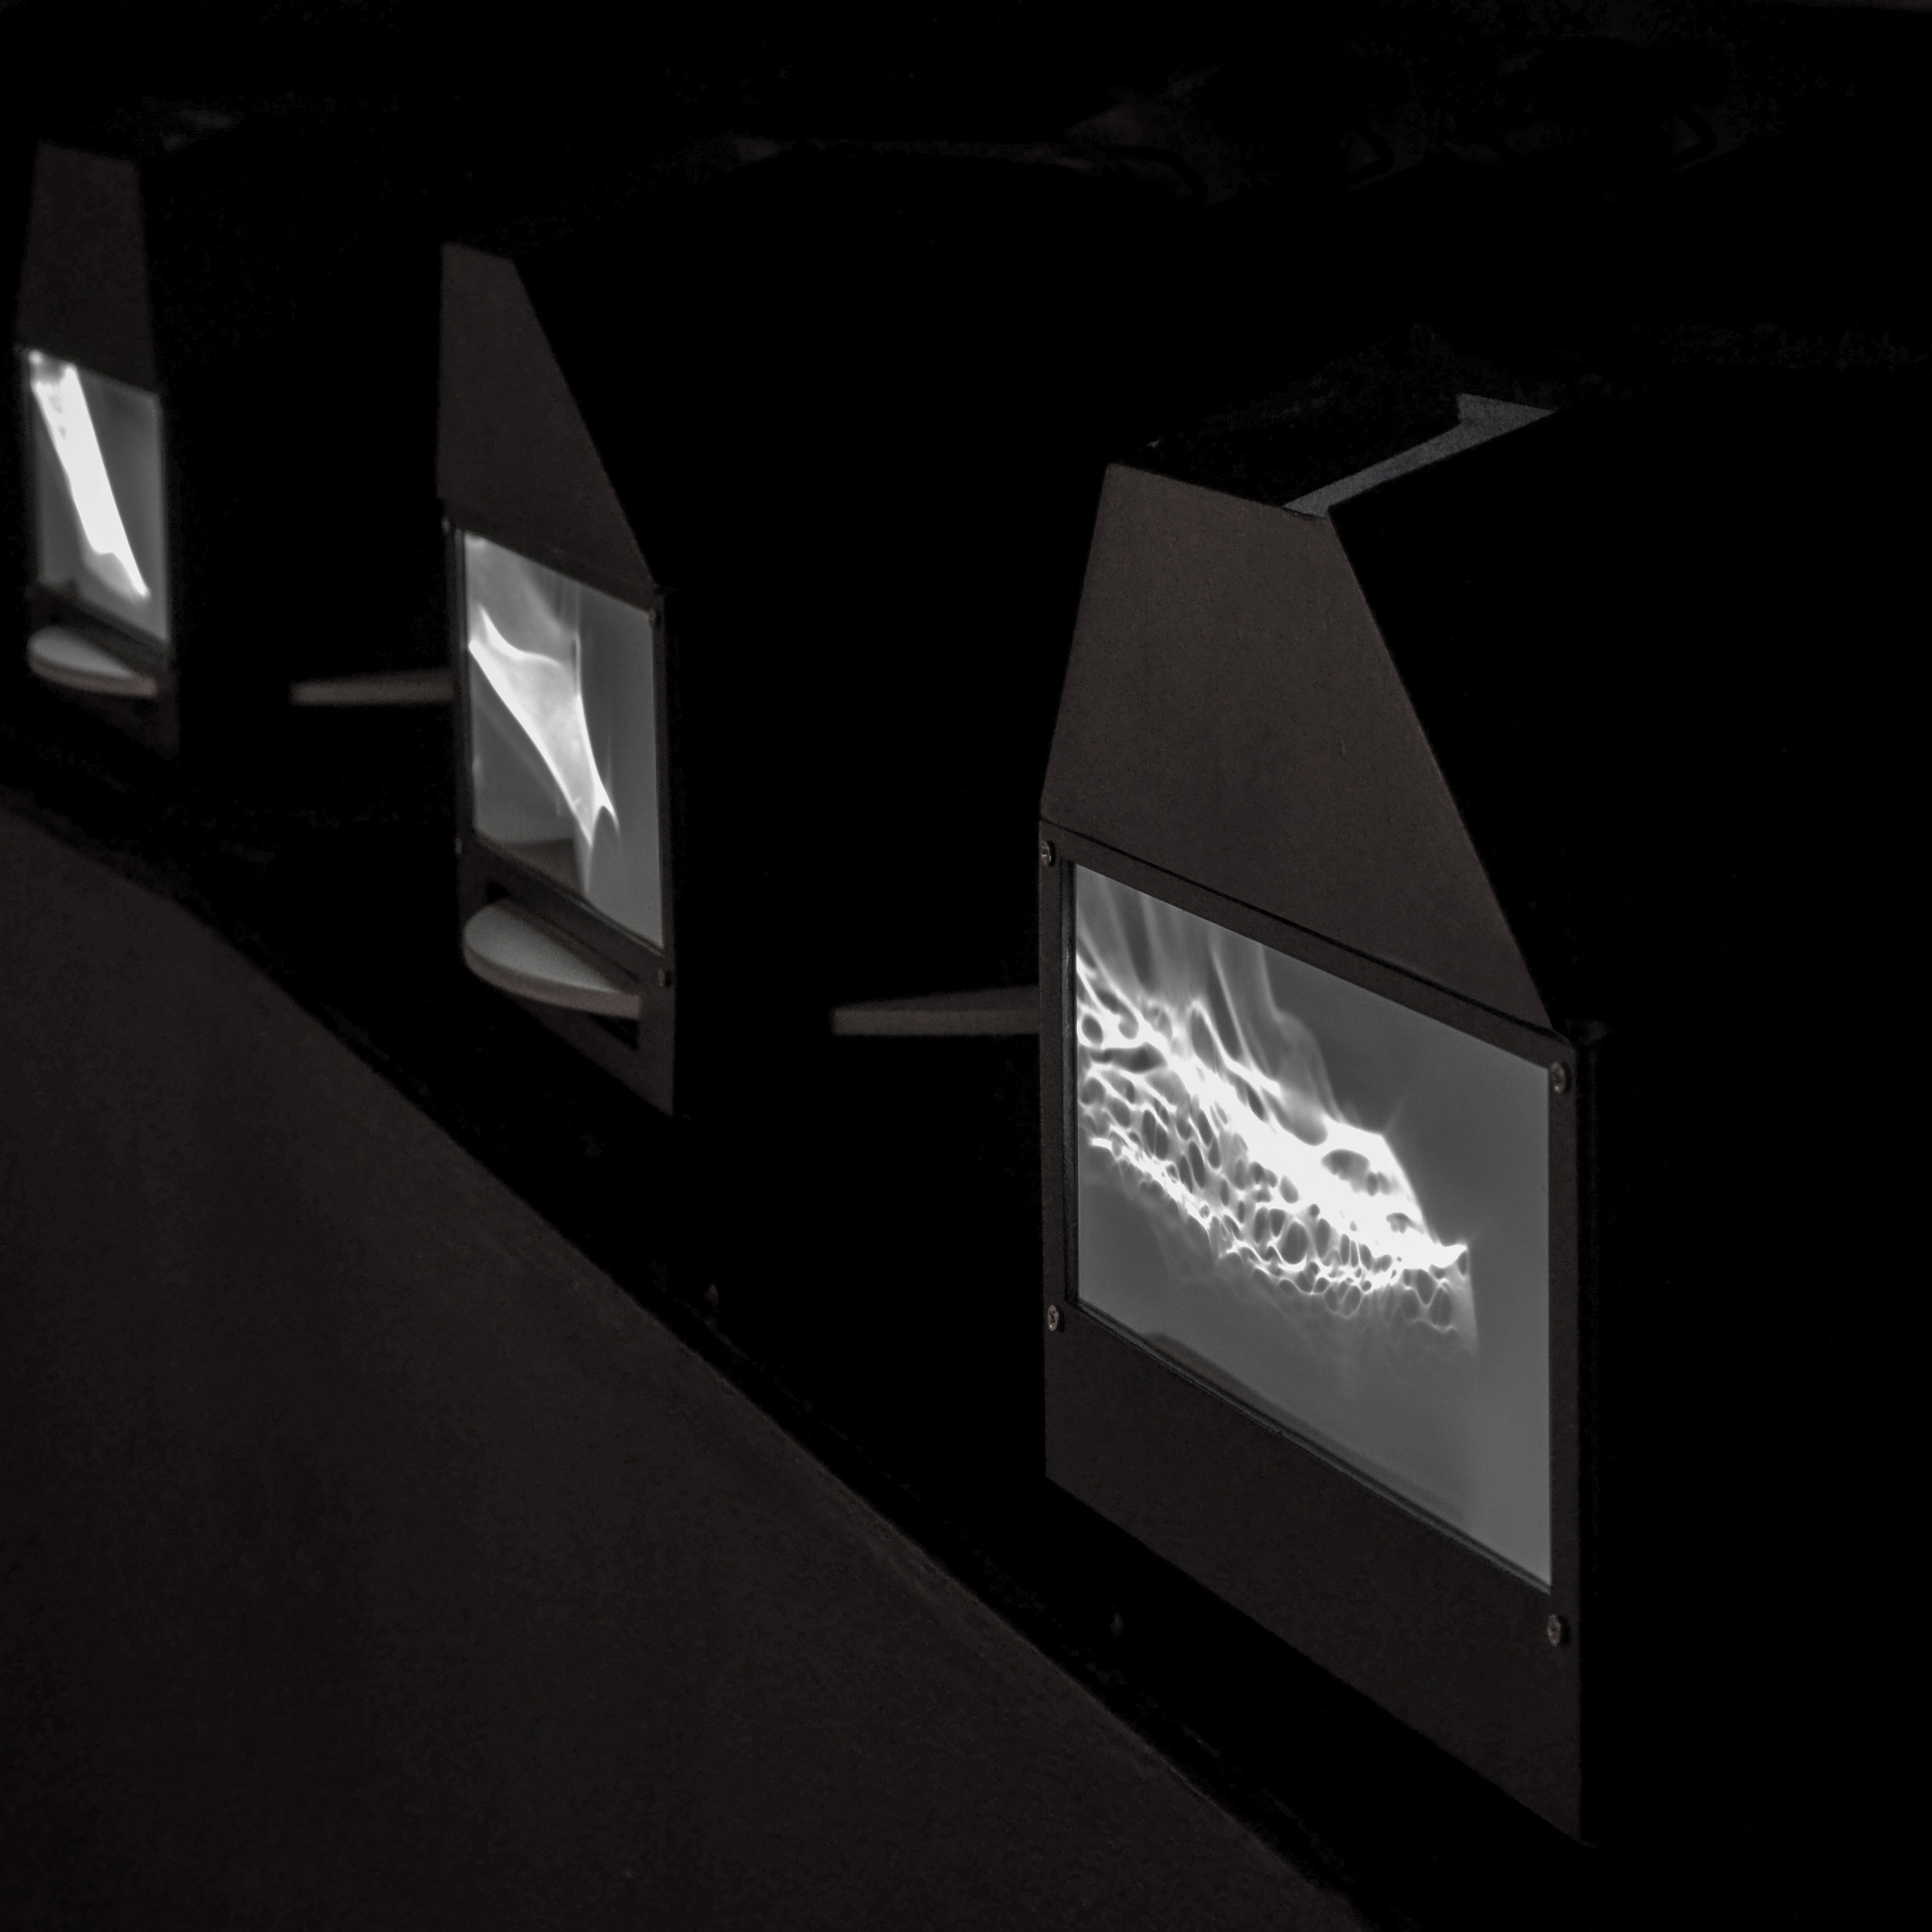 Light_boxes_Yael_Erel_light_install